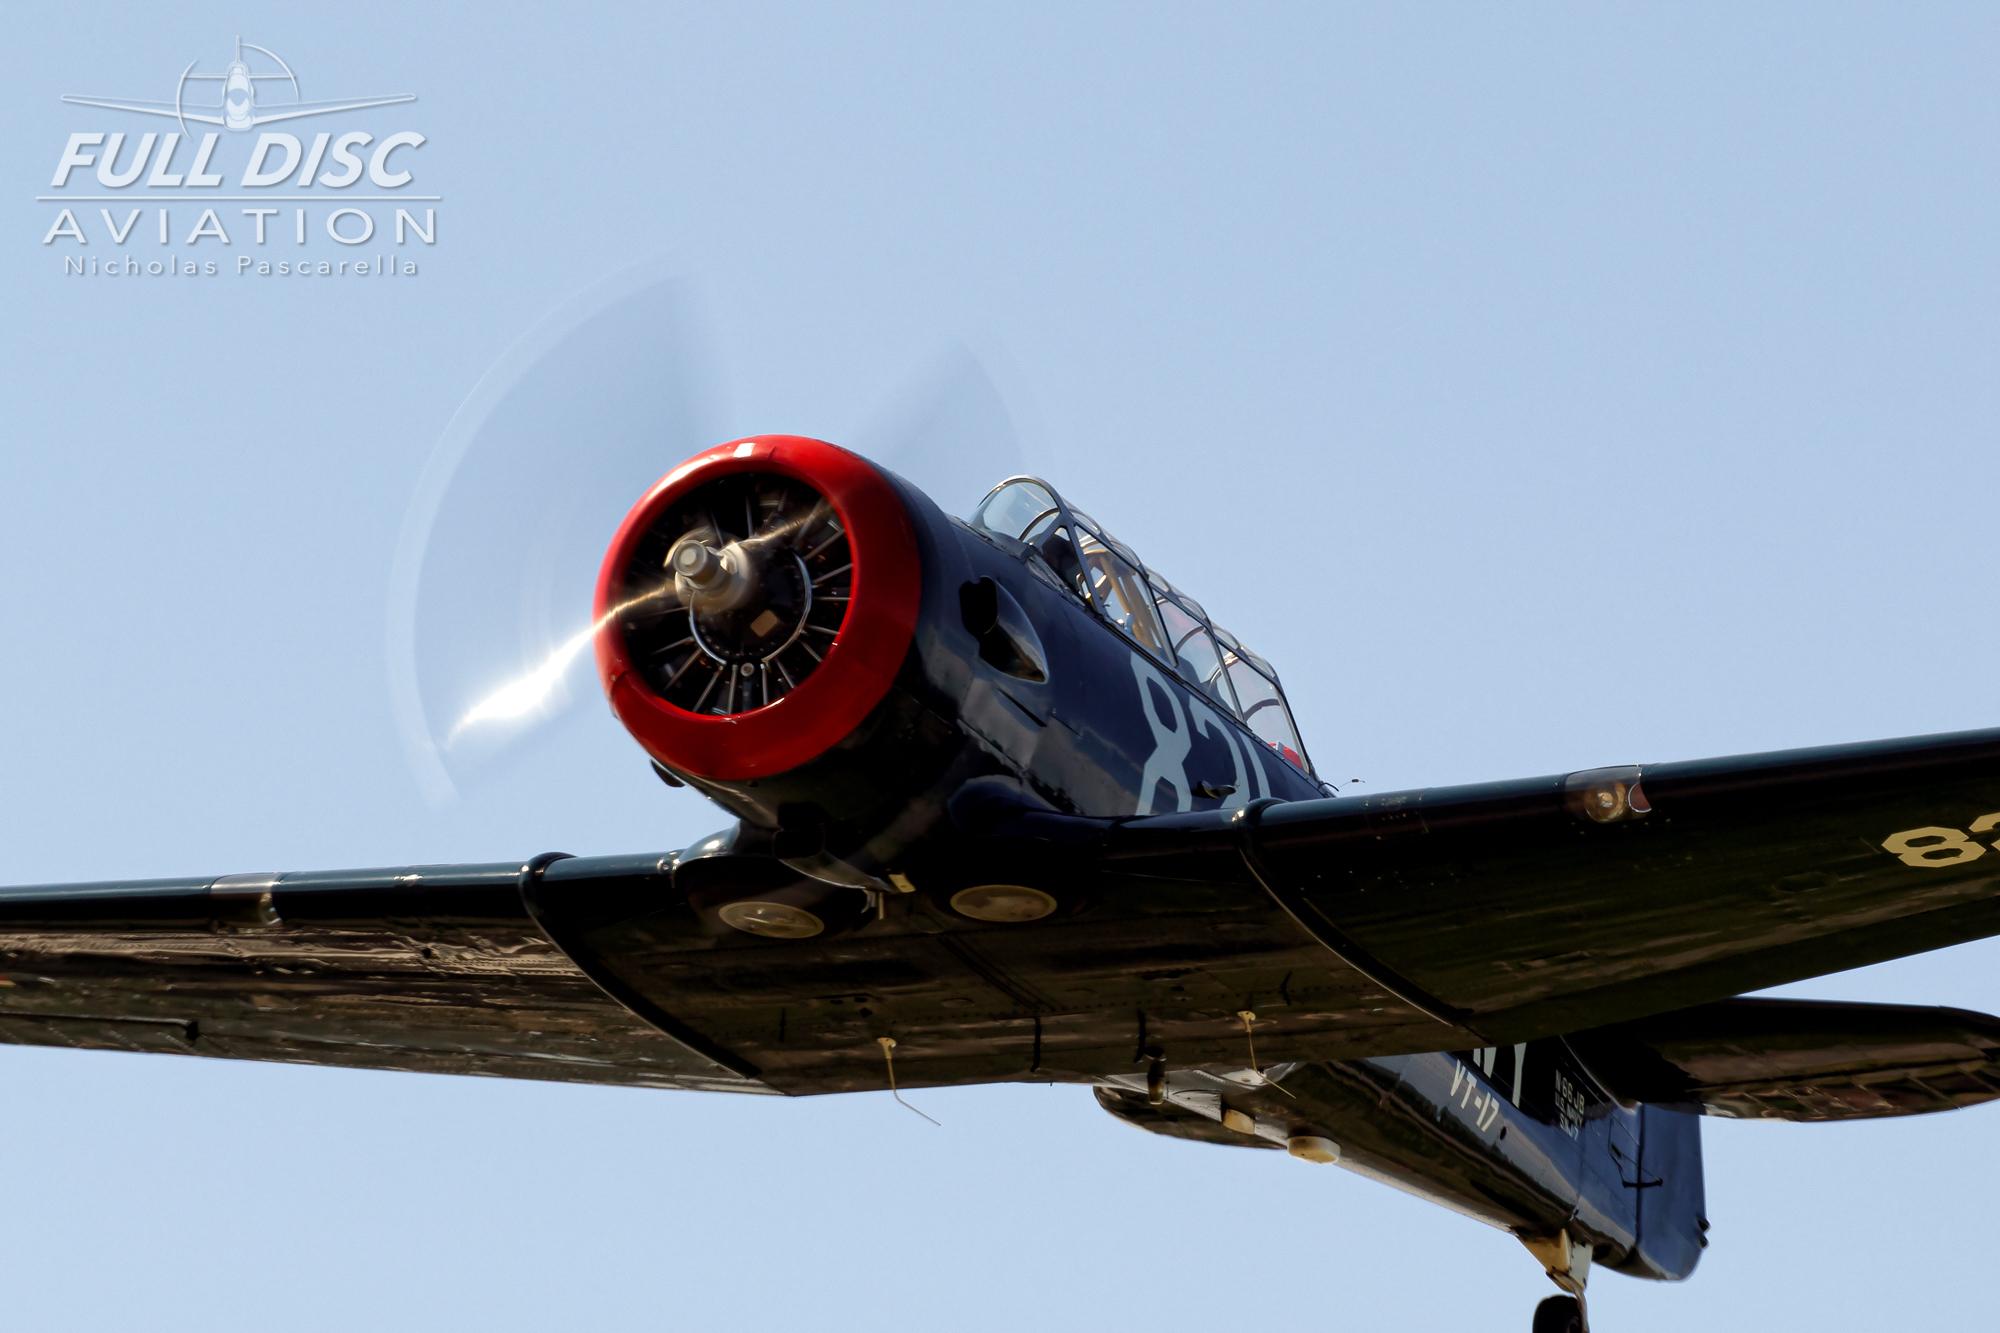 americanairpowermuseum_nicholaspascarella_nickpascarella_fulldiscaviation_legendsofairpower2019_aviation_warbird_t6_flyover_texan_black.jpg